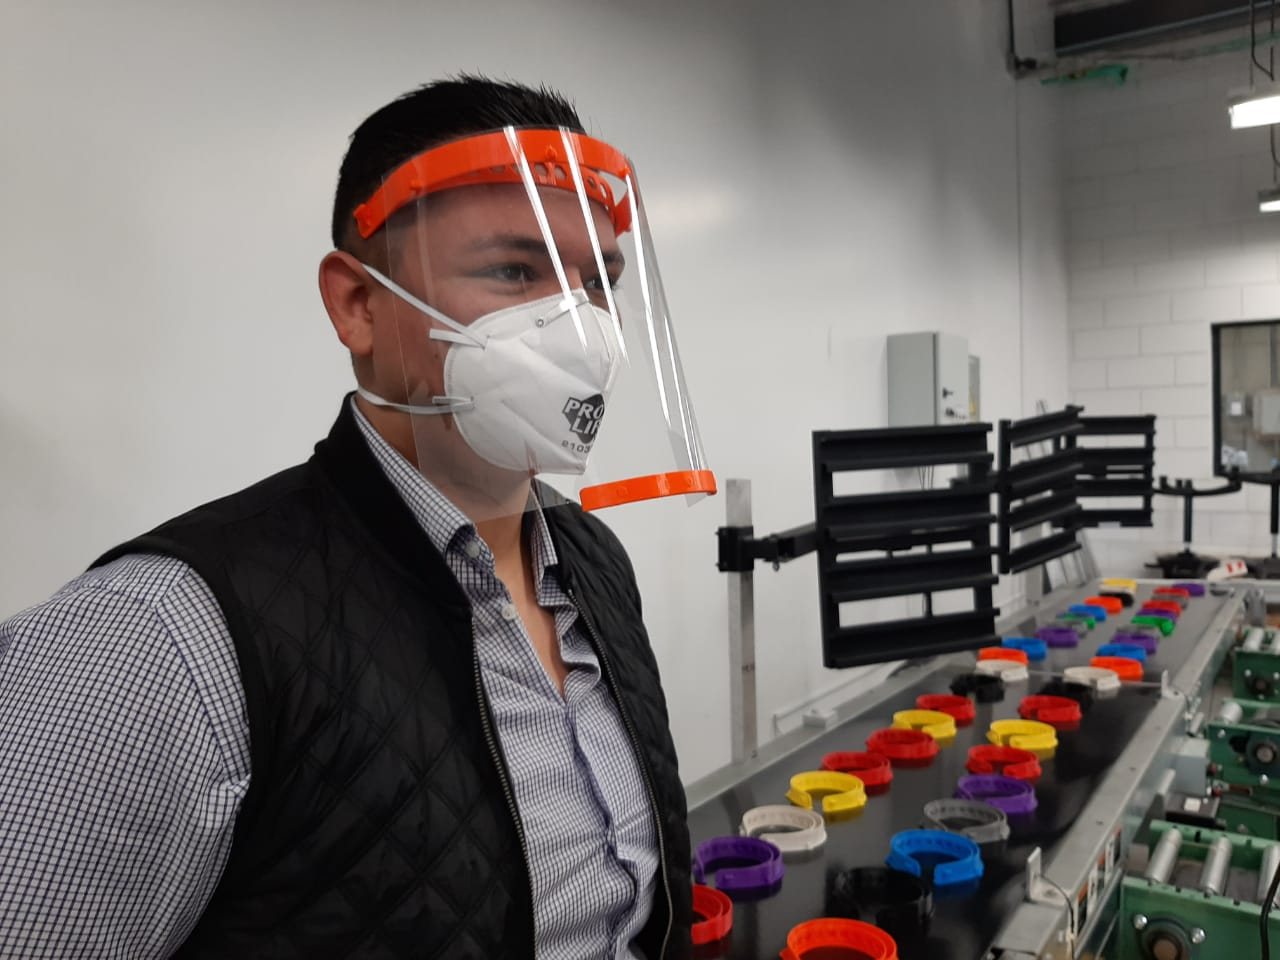 Diseñan estudiantes prototipo de careta para prevenir COVID 19